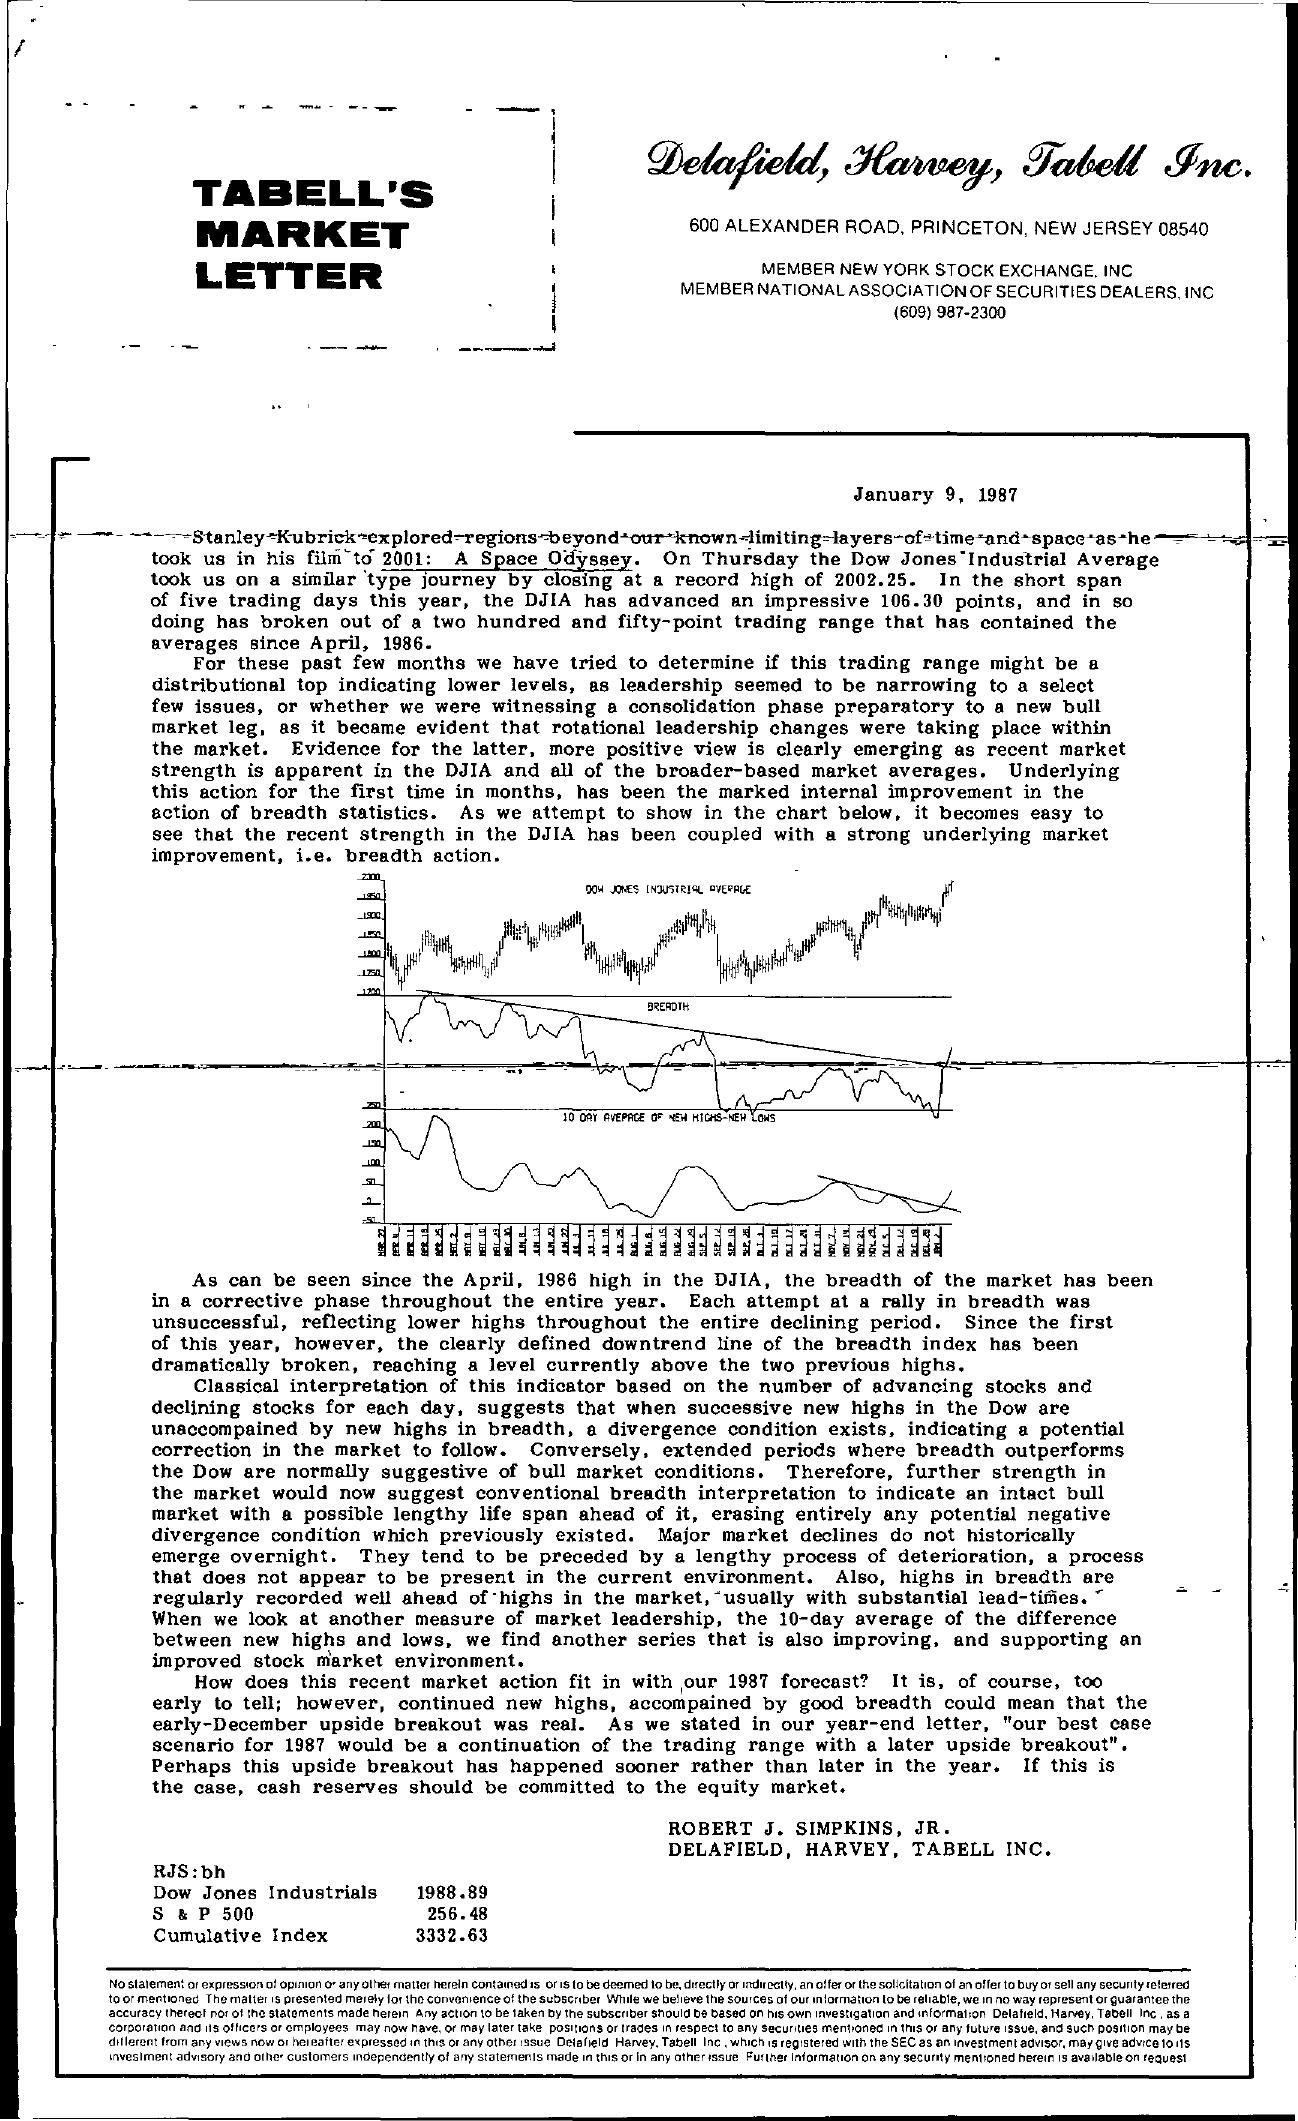 Tabell's Market Letter - January 09, 1987